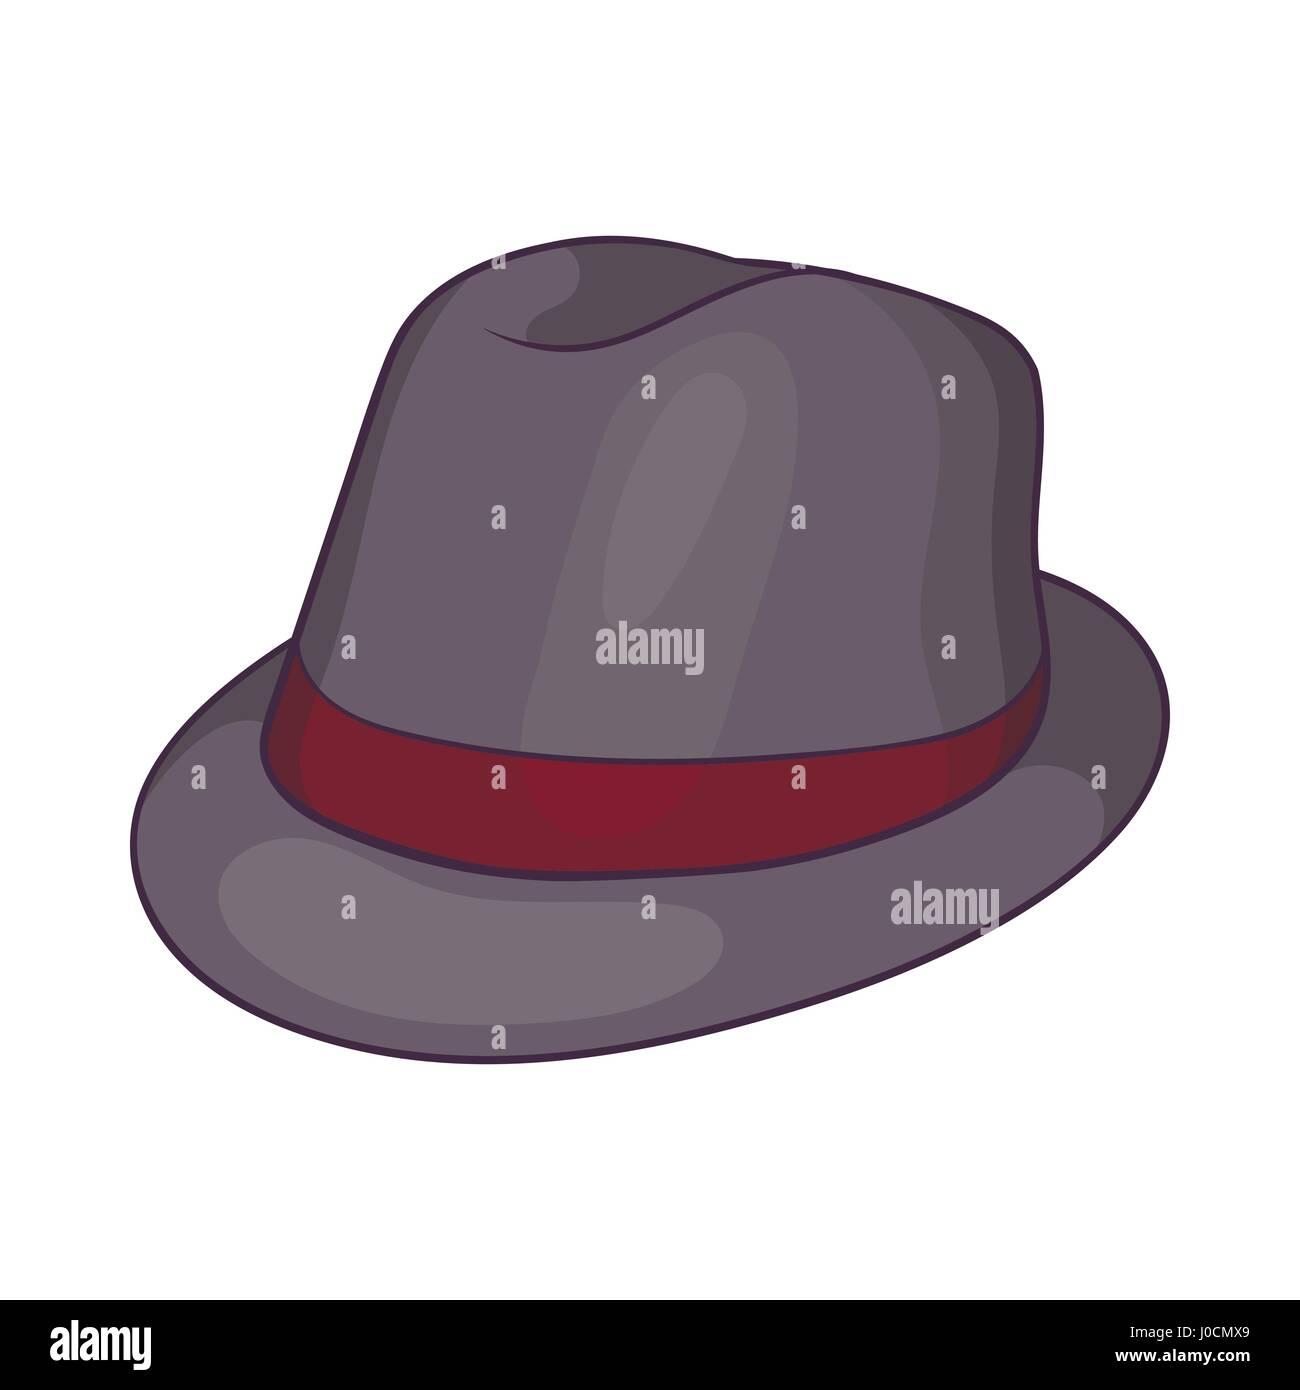 4d29082c3342a Icono de sombrero gris